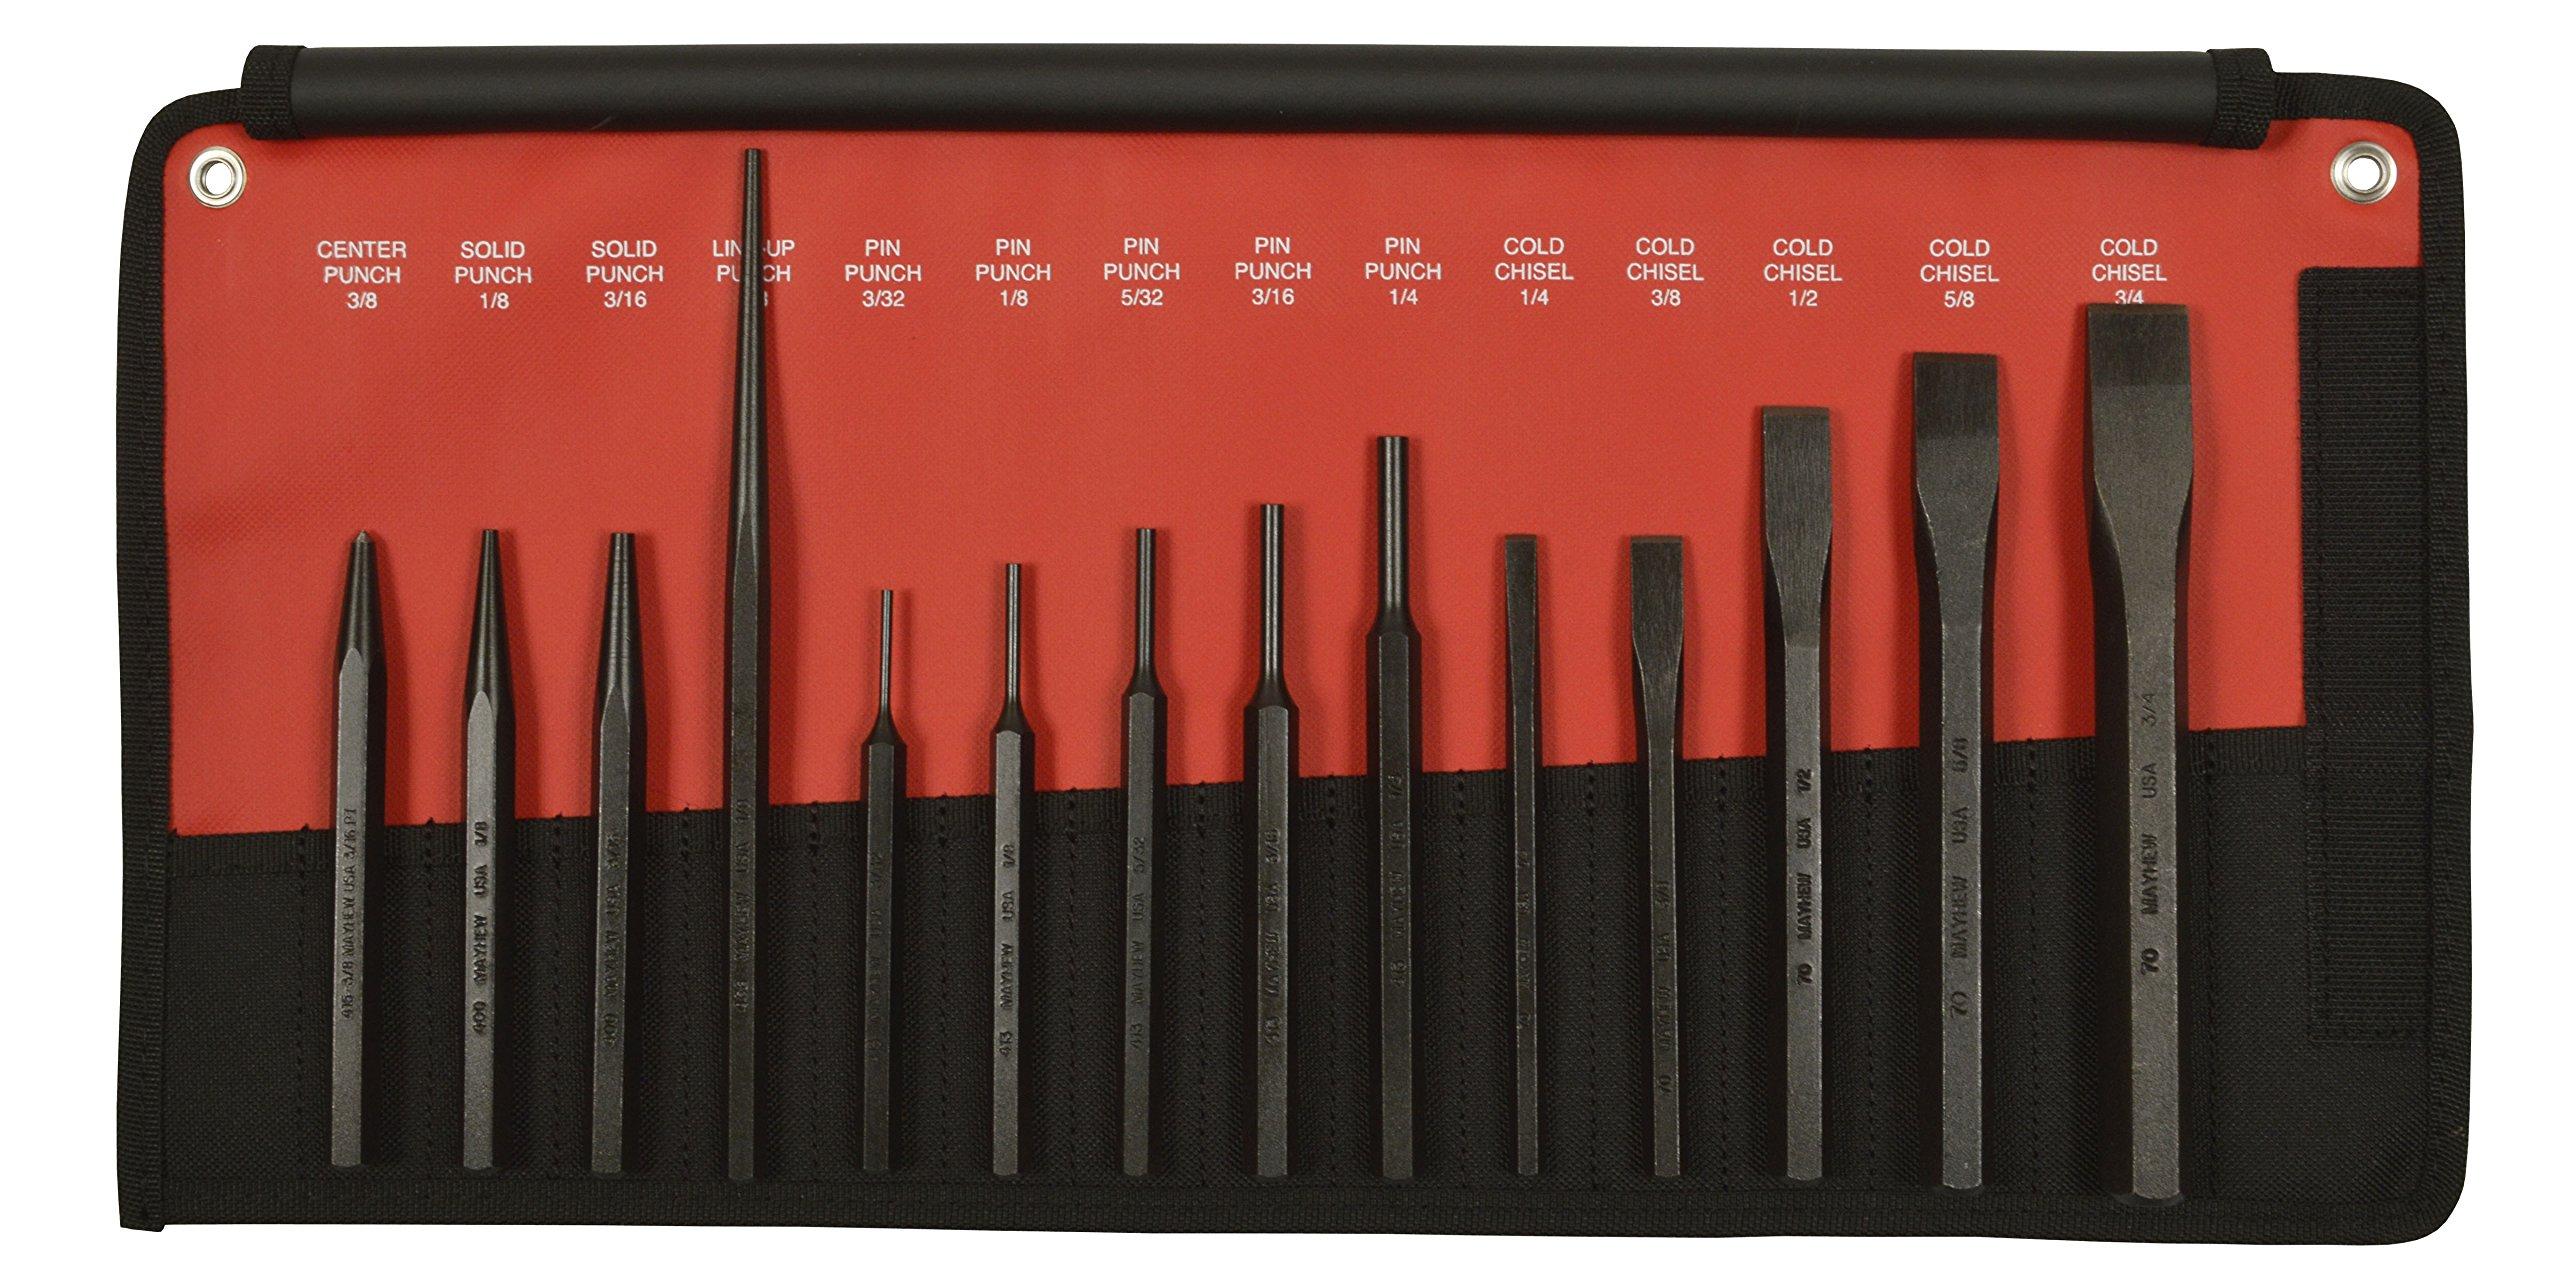 Mayhew Pro 61044 Punch and Chisel Kit, 14-Piece